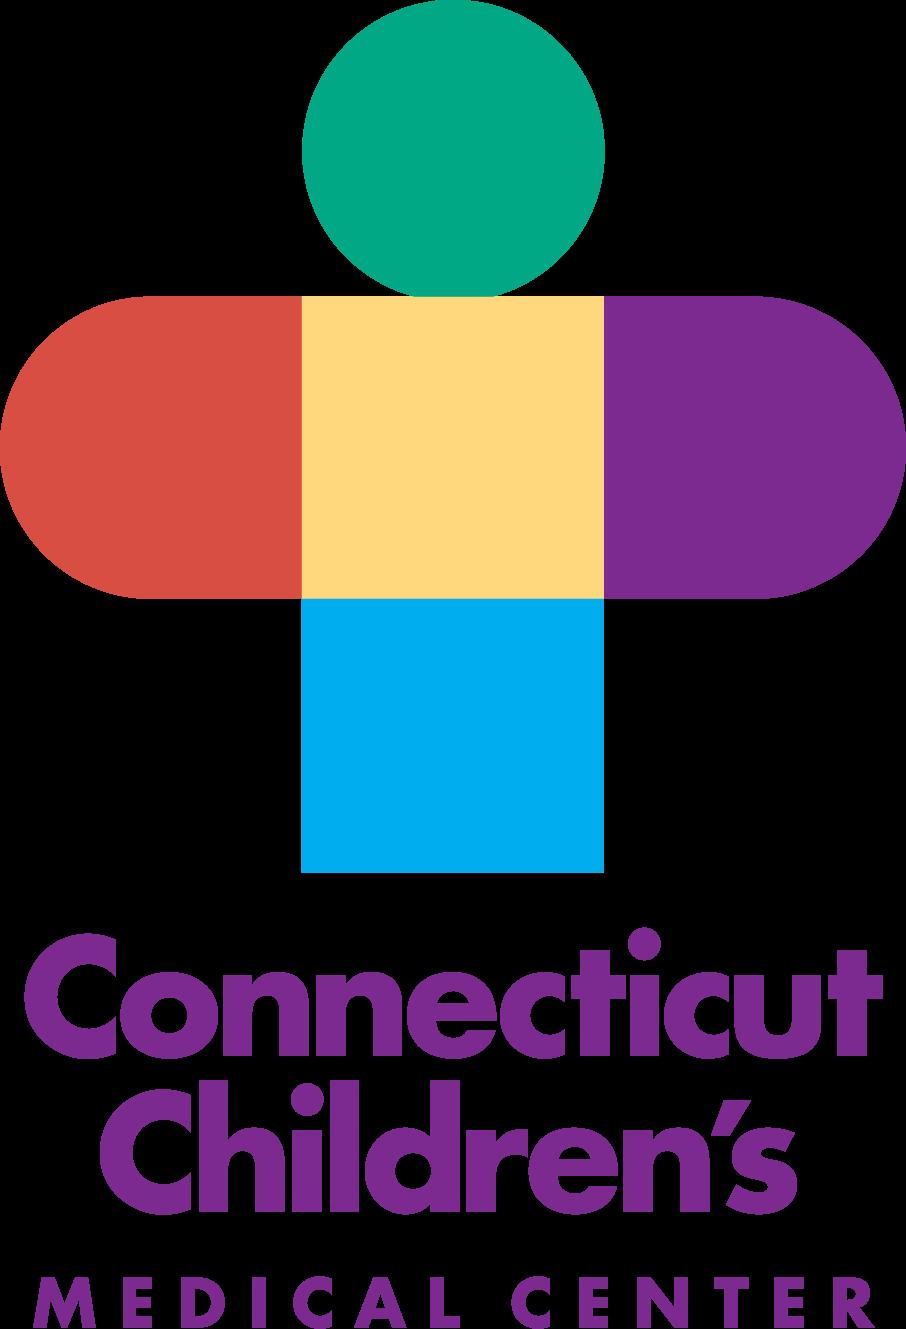 CY Childrens Medical Center CME Logo